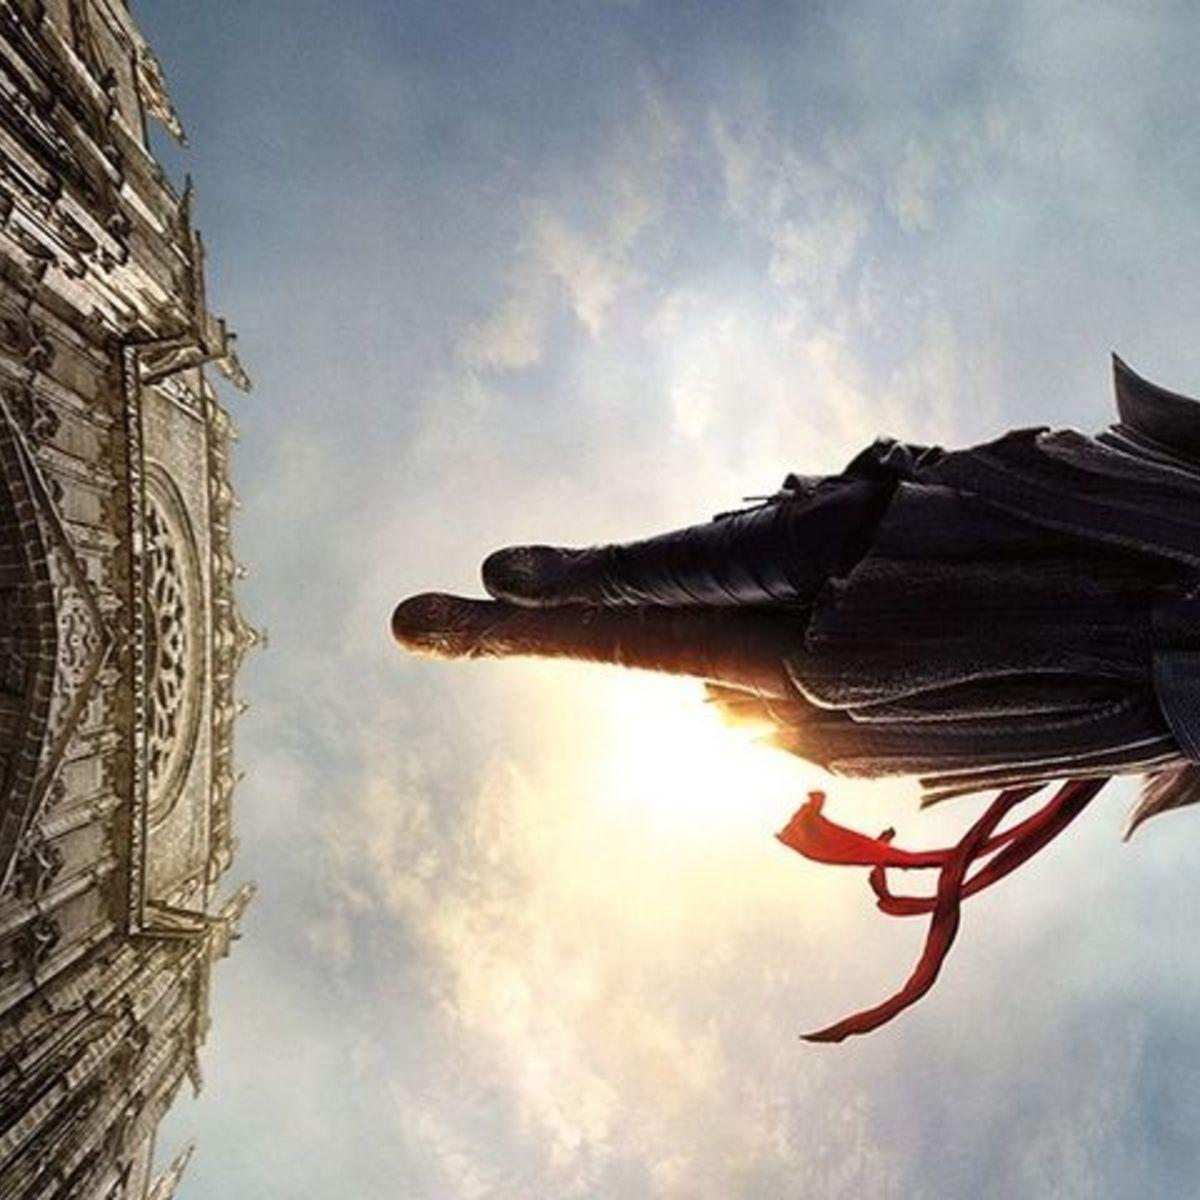 Assassins-Creed-Movie-Poster_1_0.jpg